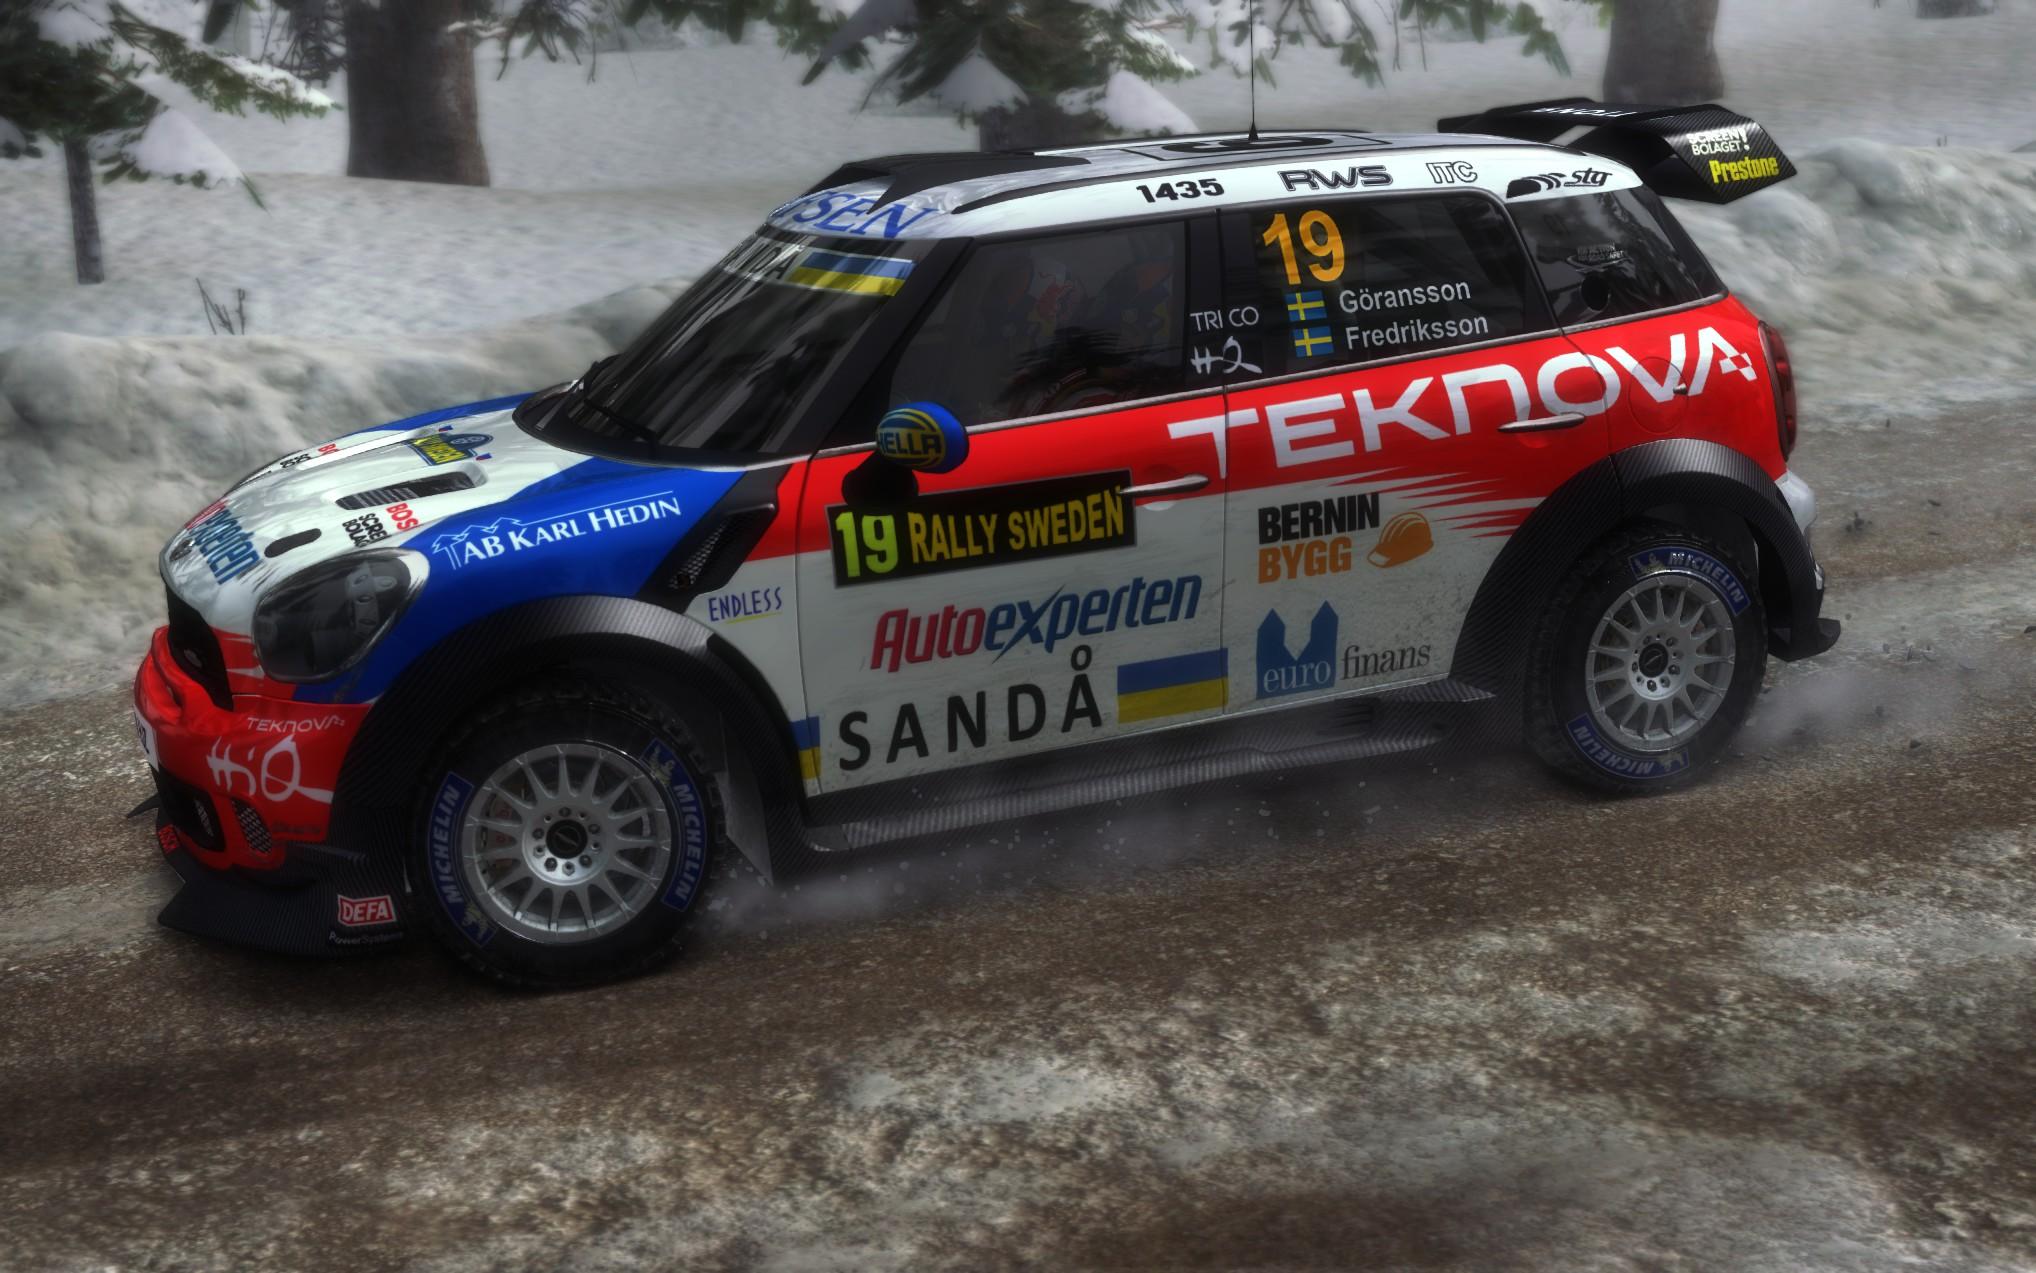 Mini wrc Goransson 2.jpg